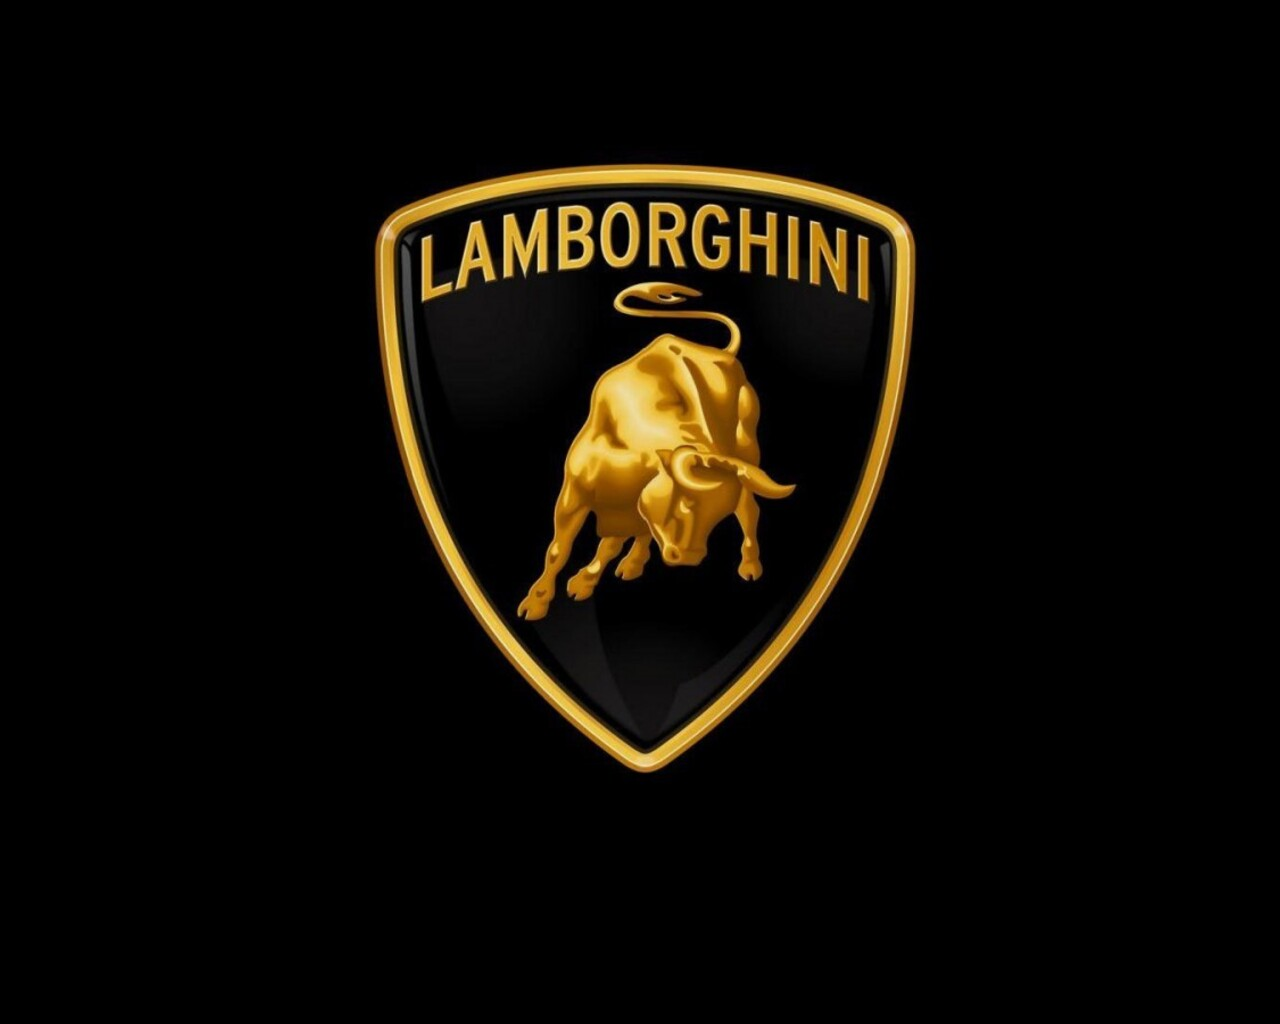 1280x1024 Lamborghini Car Logo 1280x1024 Resolution Hd 4k Wallpapers